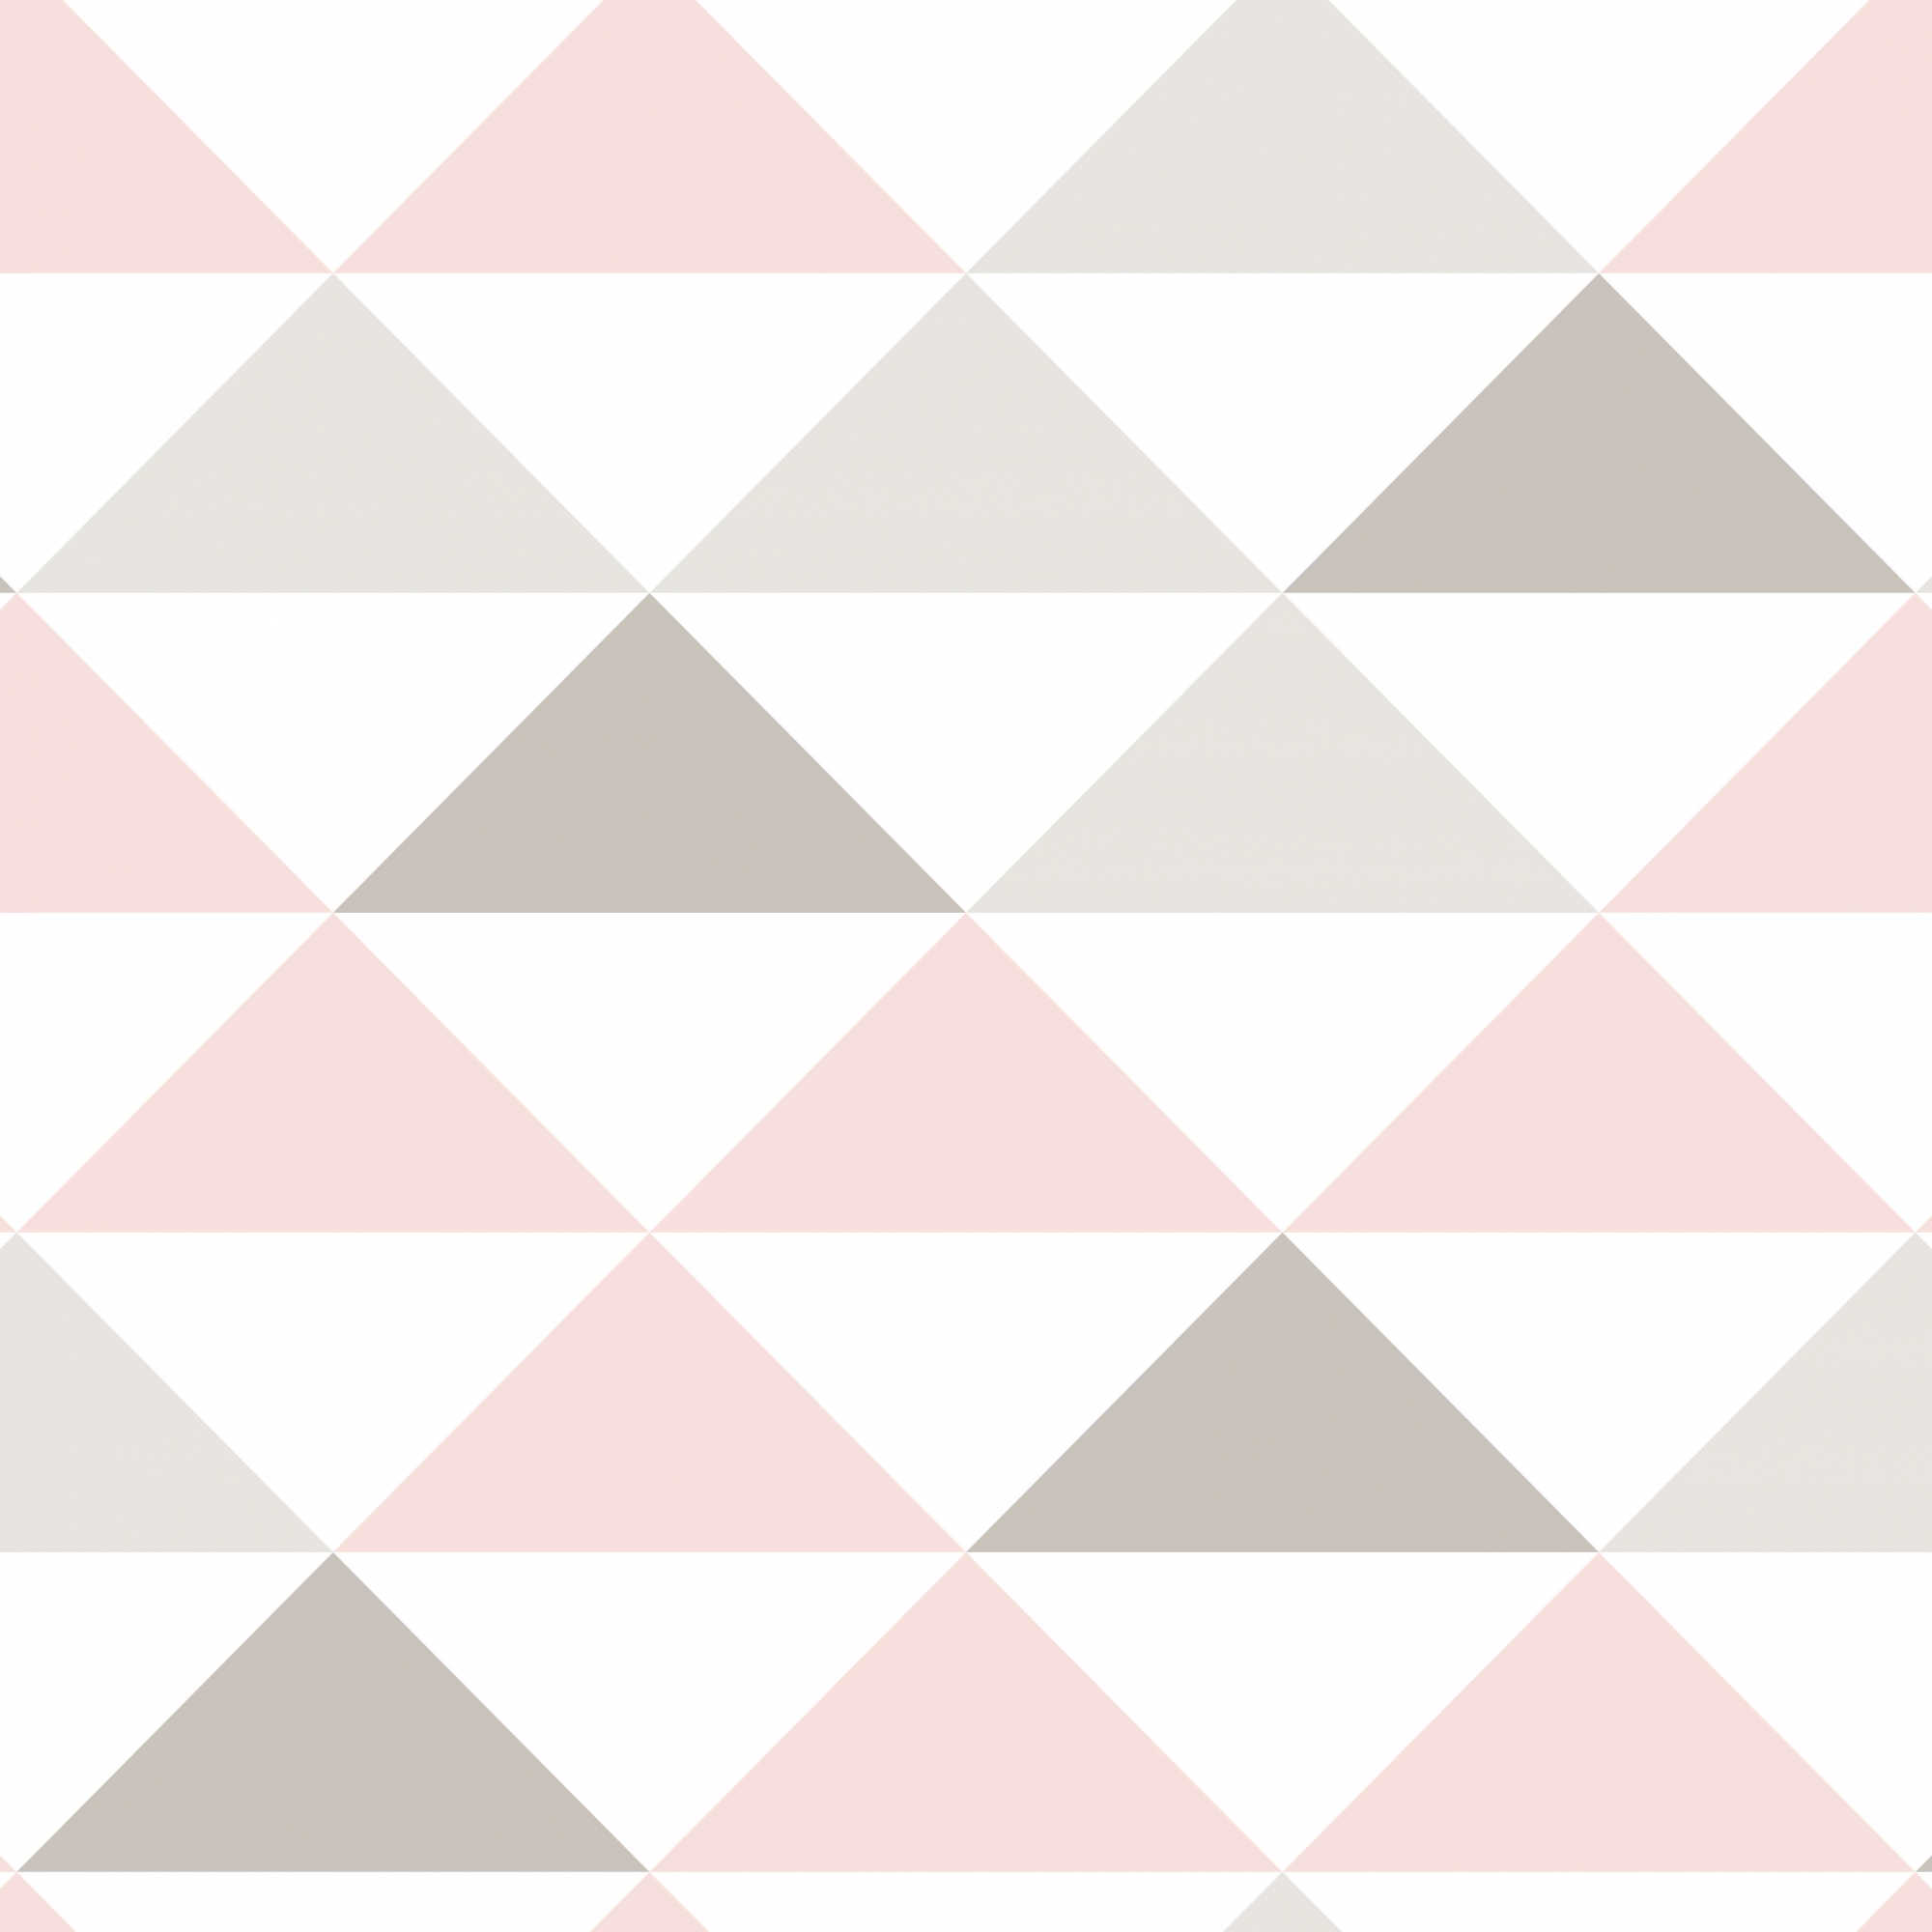 Papel Parede Geométrico Triângulos Rosa e Cinza